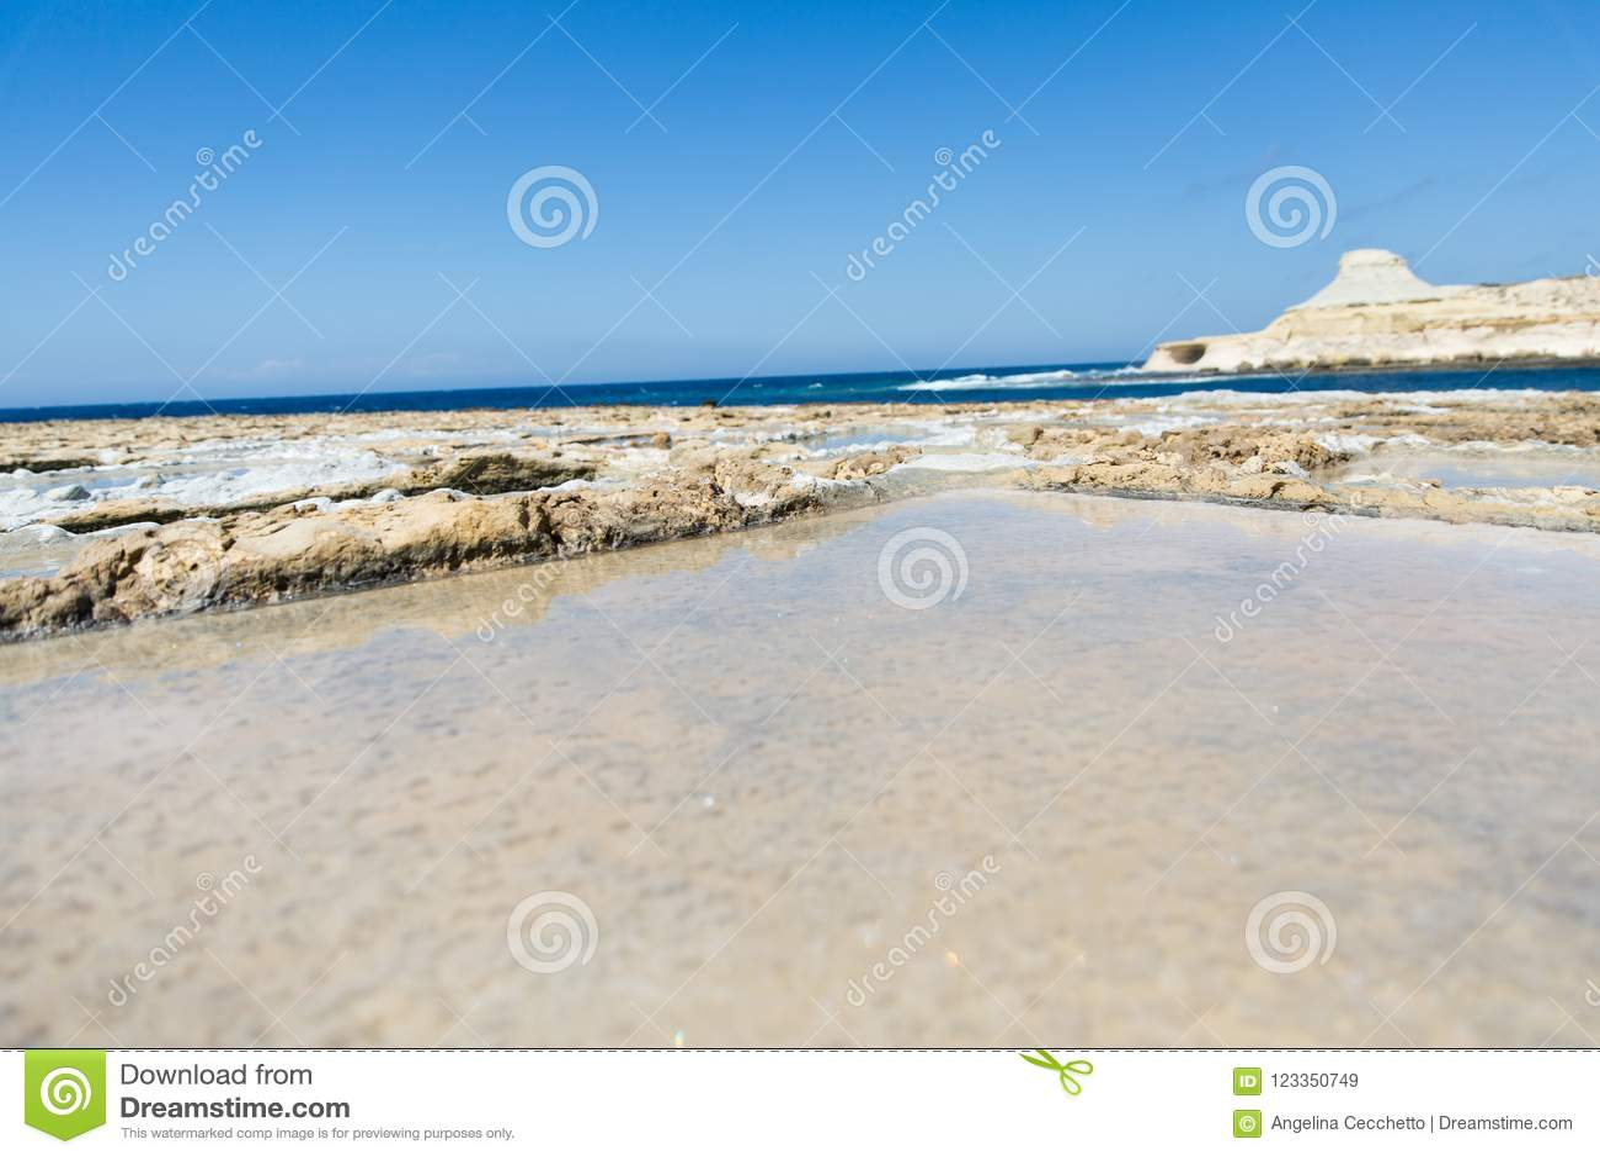 Limestone Quarry Industry At Gozo Island Stock Photo ...   Gozo Limestone